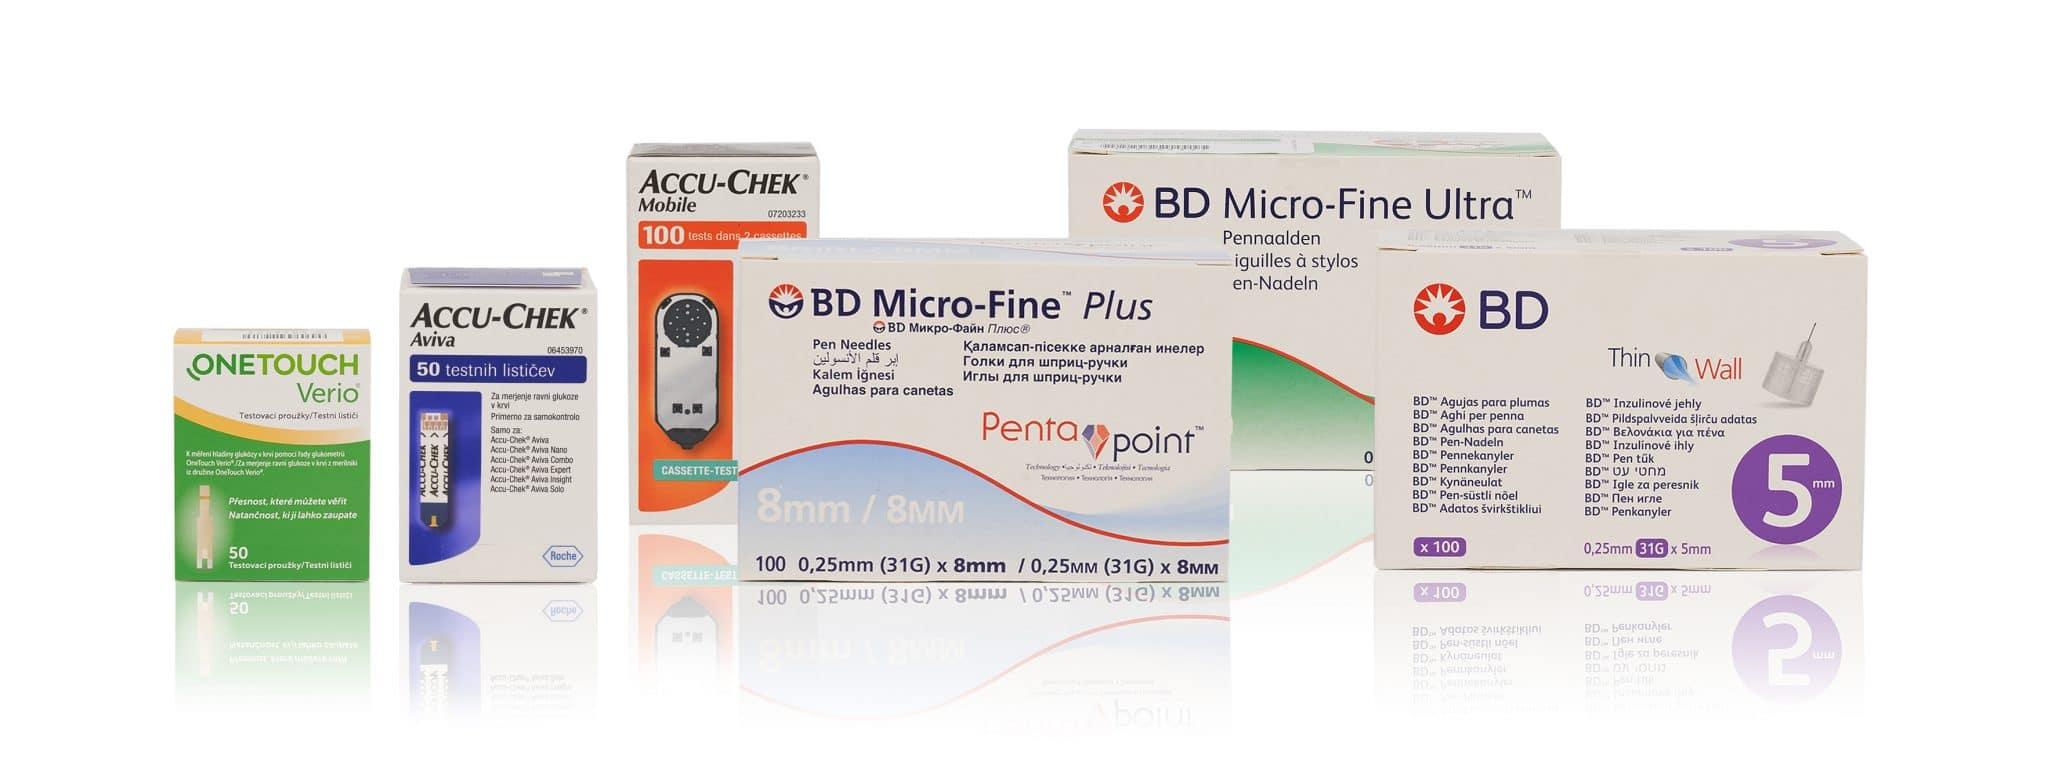 Import Diabetes Produkte - Pen Nadeln BD Micro-Fine, Thin Wall - Teststreifen OneTouch Verio, Roche Accu-Chek, Blutzucker Messgerät Mobile